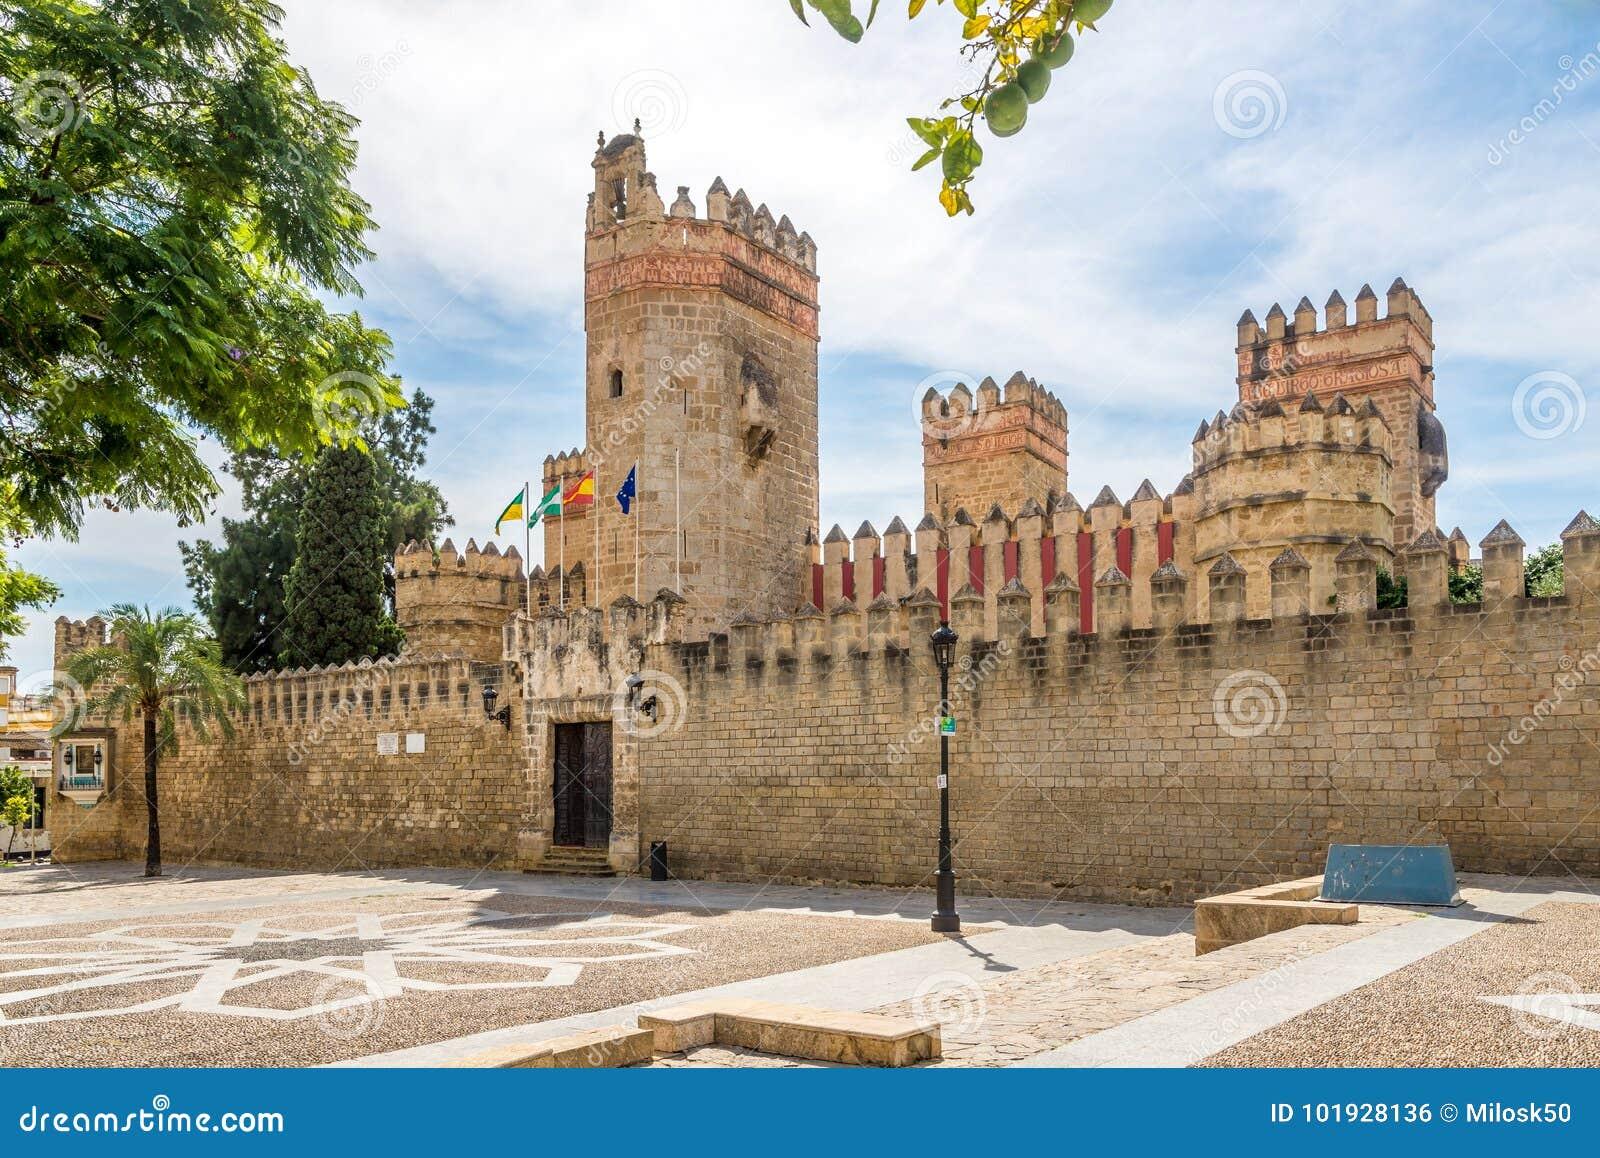 Взгляд на замке Сан Marco в городке El Puerto de Santa Maria, Испании